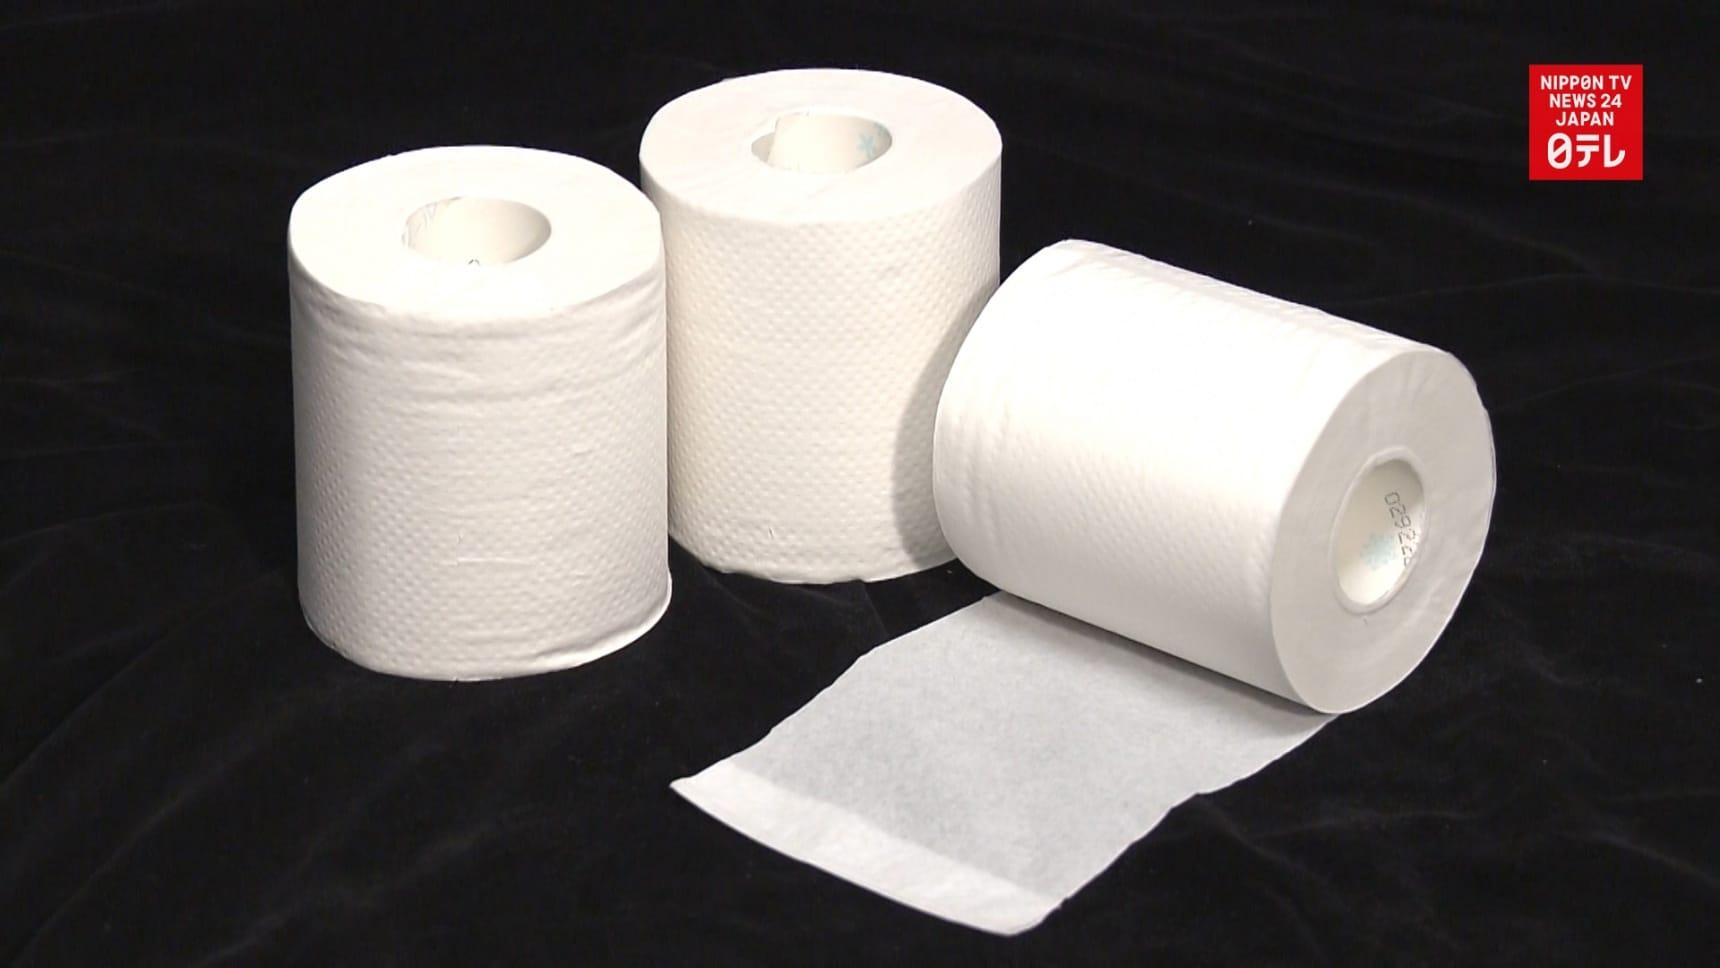 Government: Japan Has Enough Toilet Paper